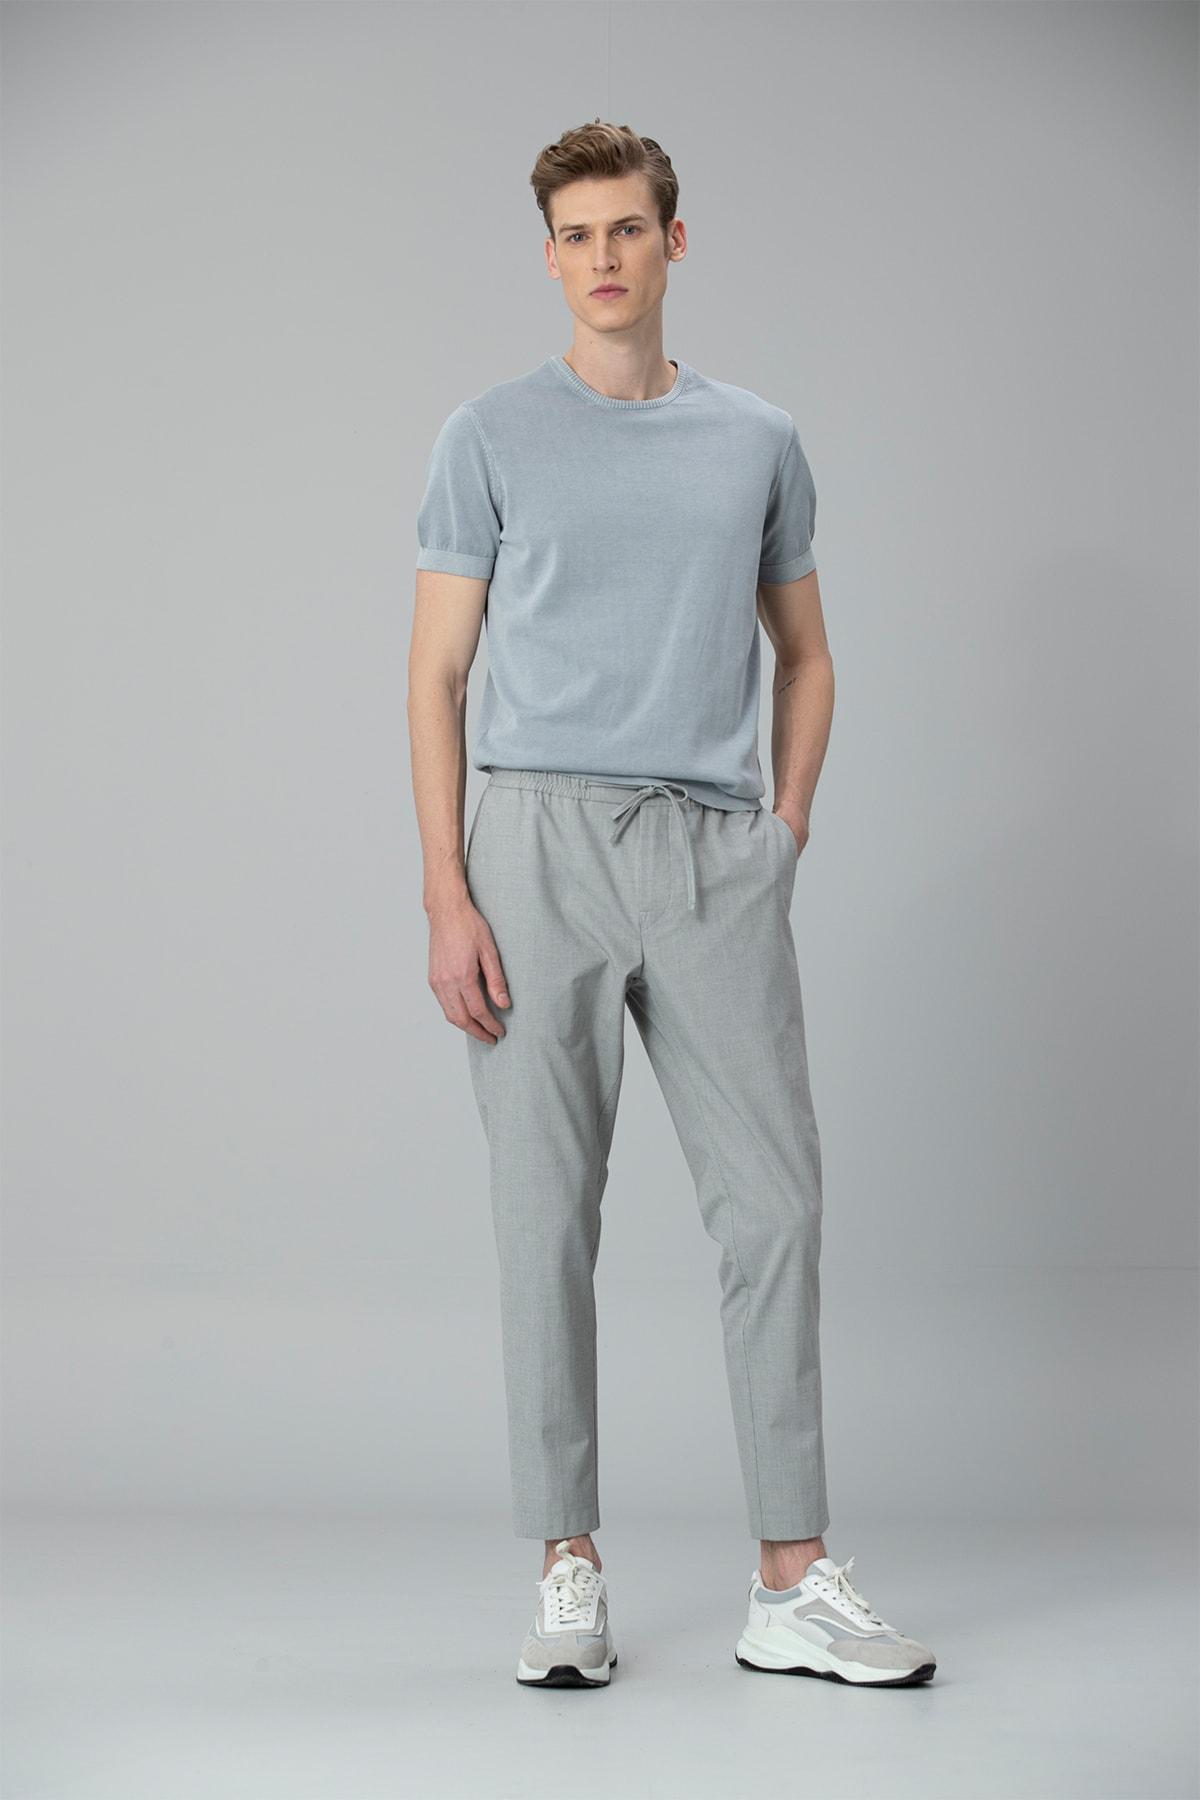 Lufian Buta Spor Chino Pantolon Tailored Fit Gri